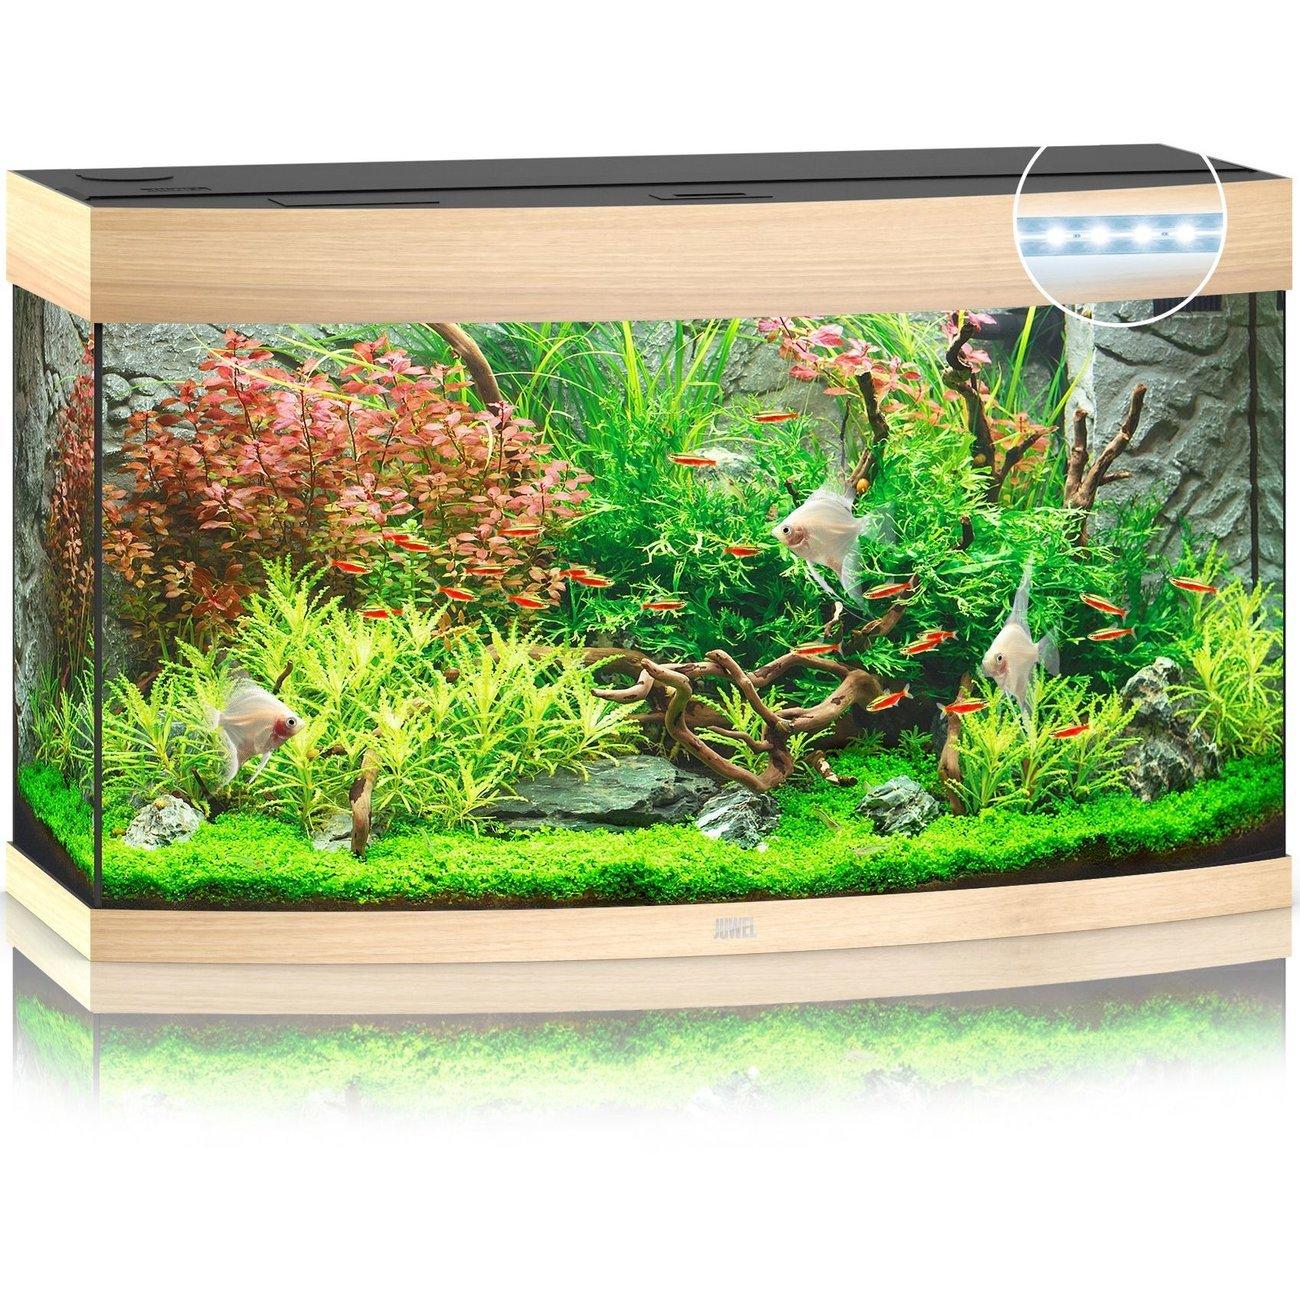 JUWEL Vision 180 LED Aquarium, 180 Liter, beige